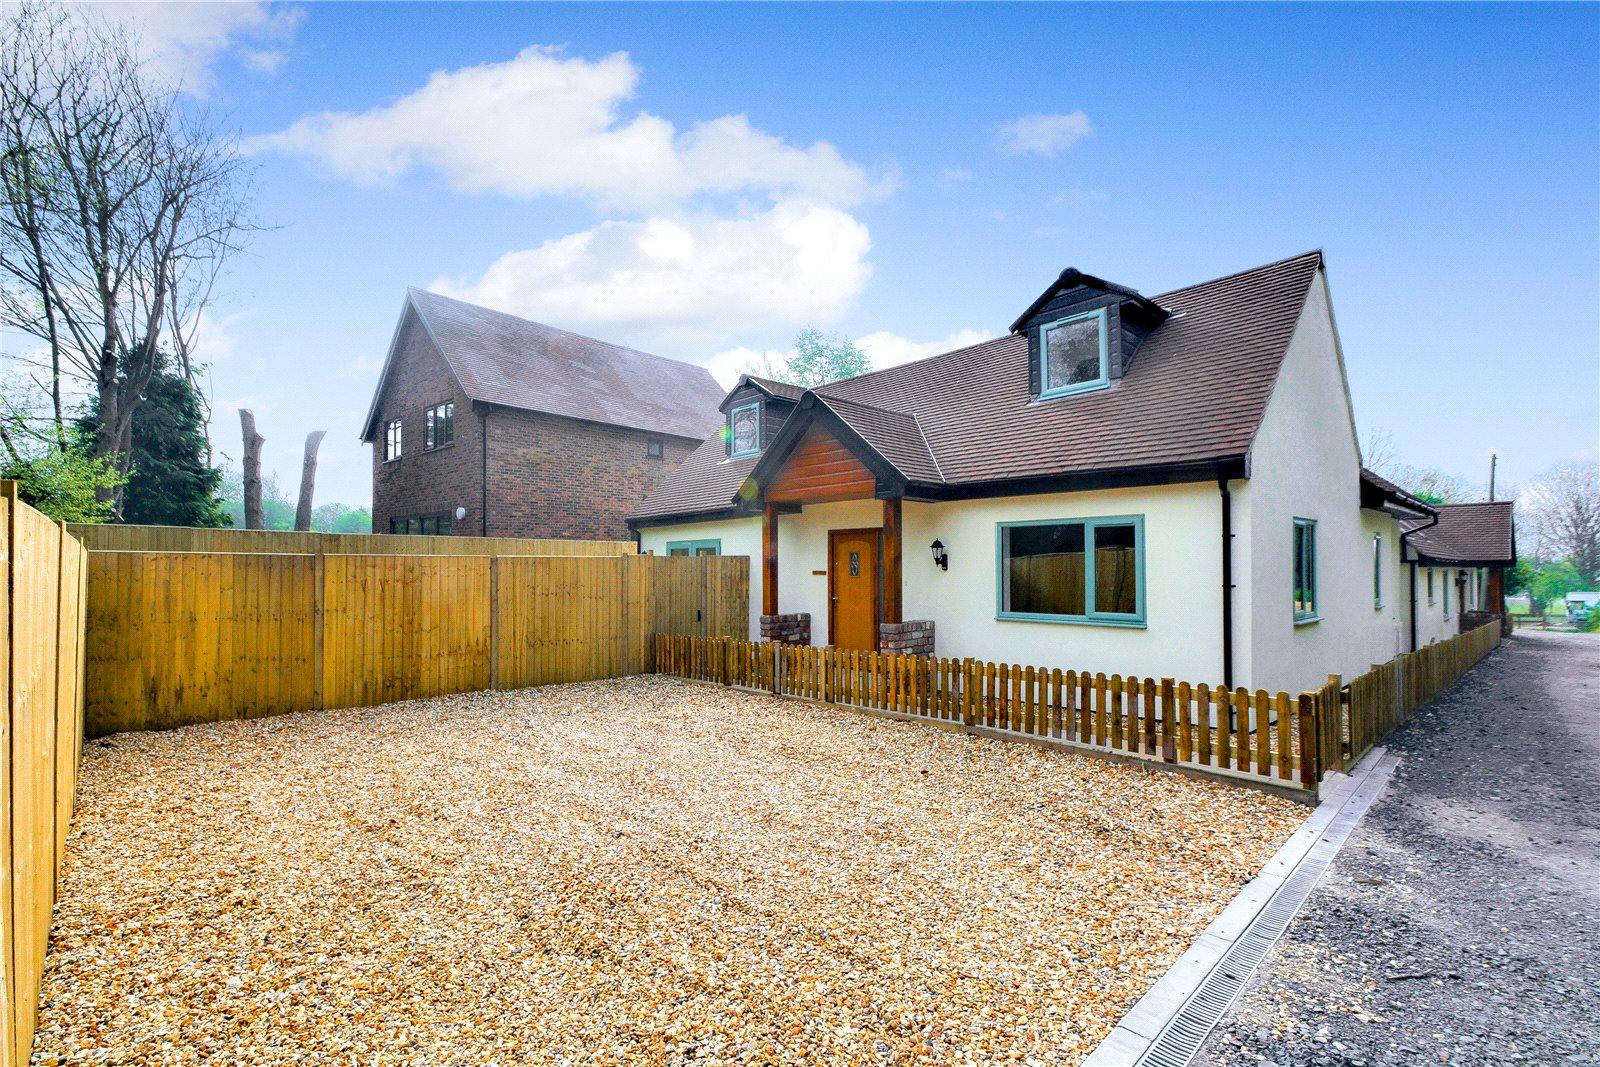 Oakleaf Cottage, Woodlands Walk, Beech Road, Telford, TF8